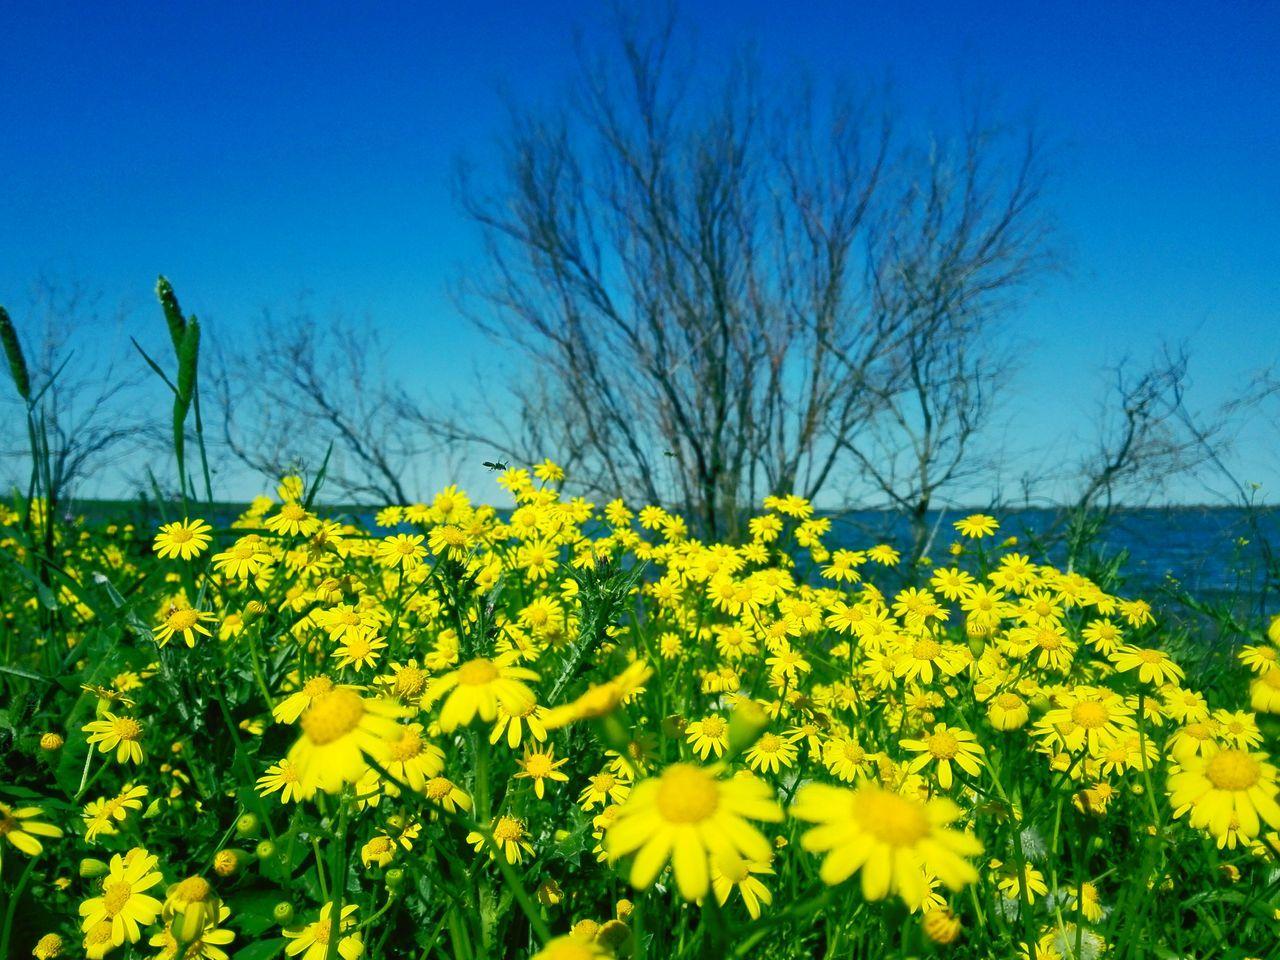 Spring Spring Flowers Yellow Yellow Flowers Yellow Flower Blue Blue Sky Good Weather Turkmen Turkmen Sahra Turkmensahra Golestan Iran